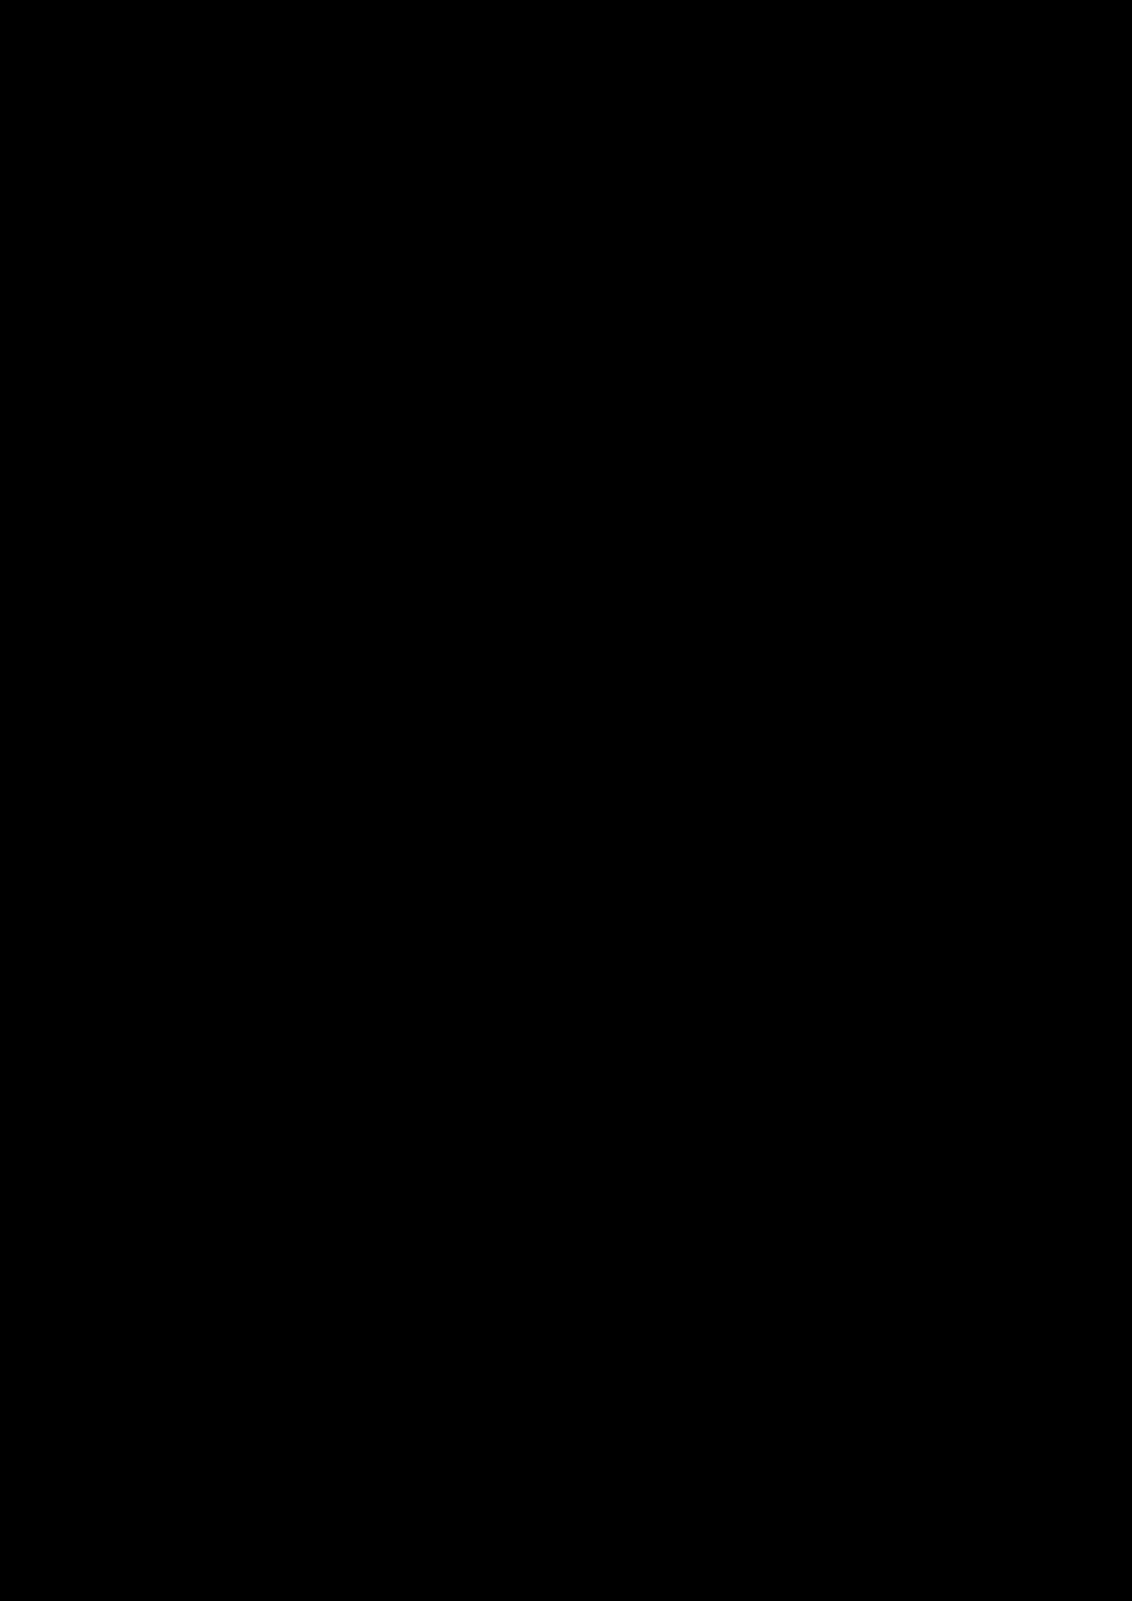 Deklassirovannyim elementam slide, Image 7